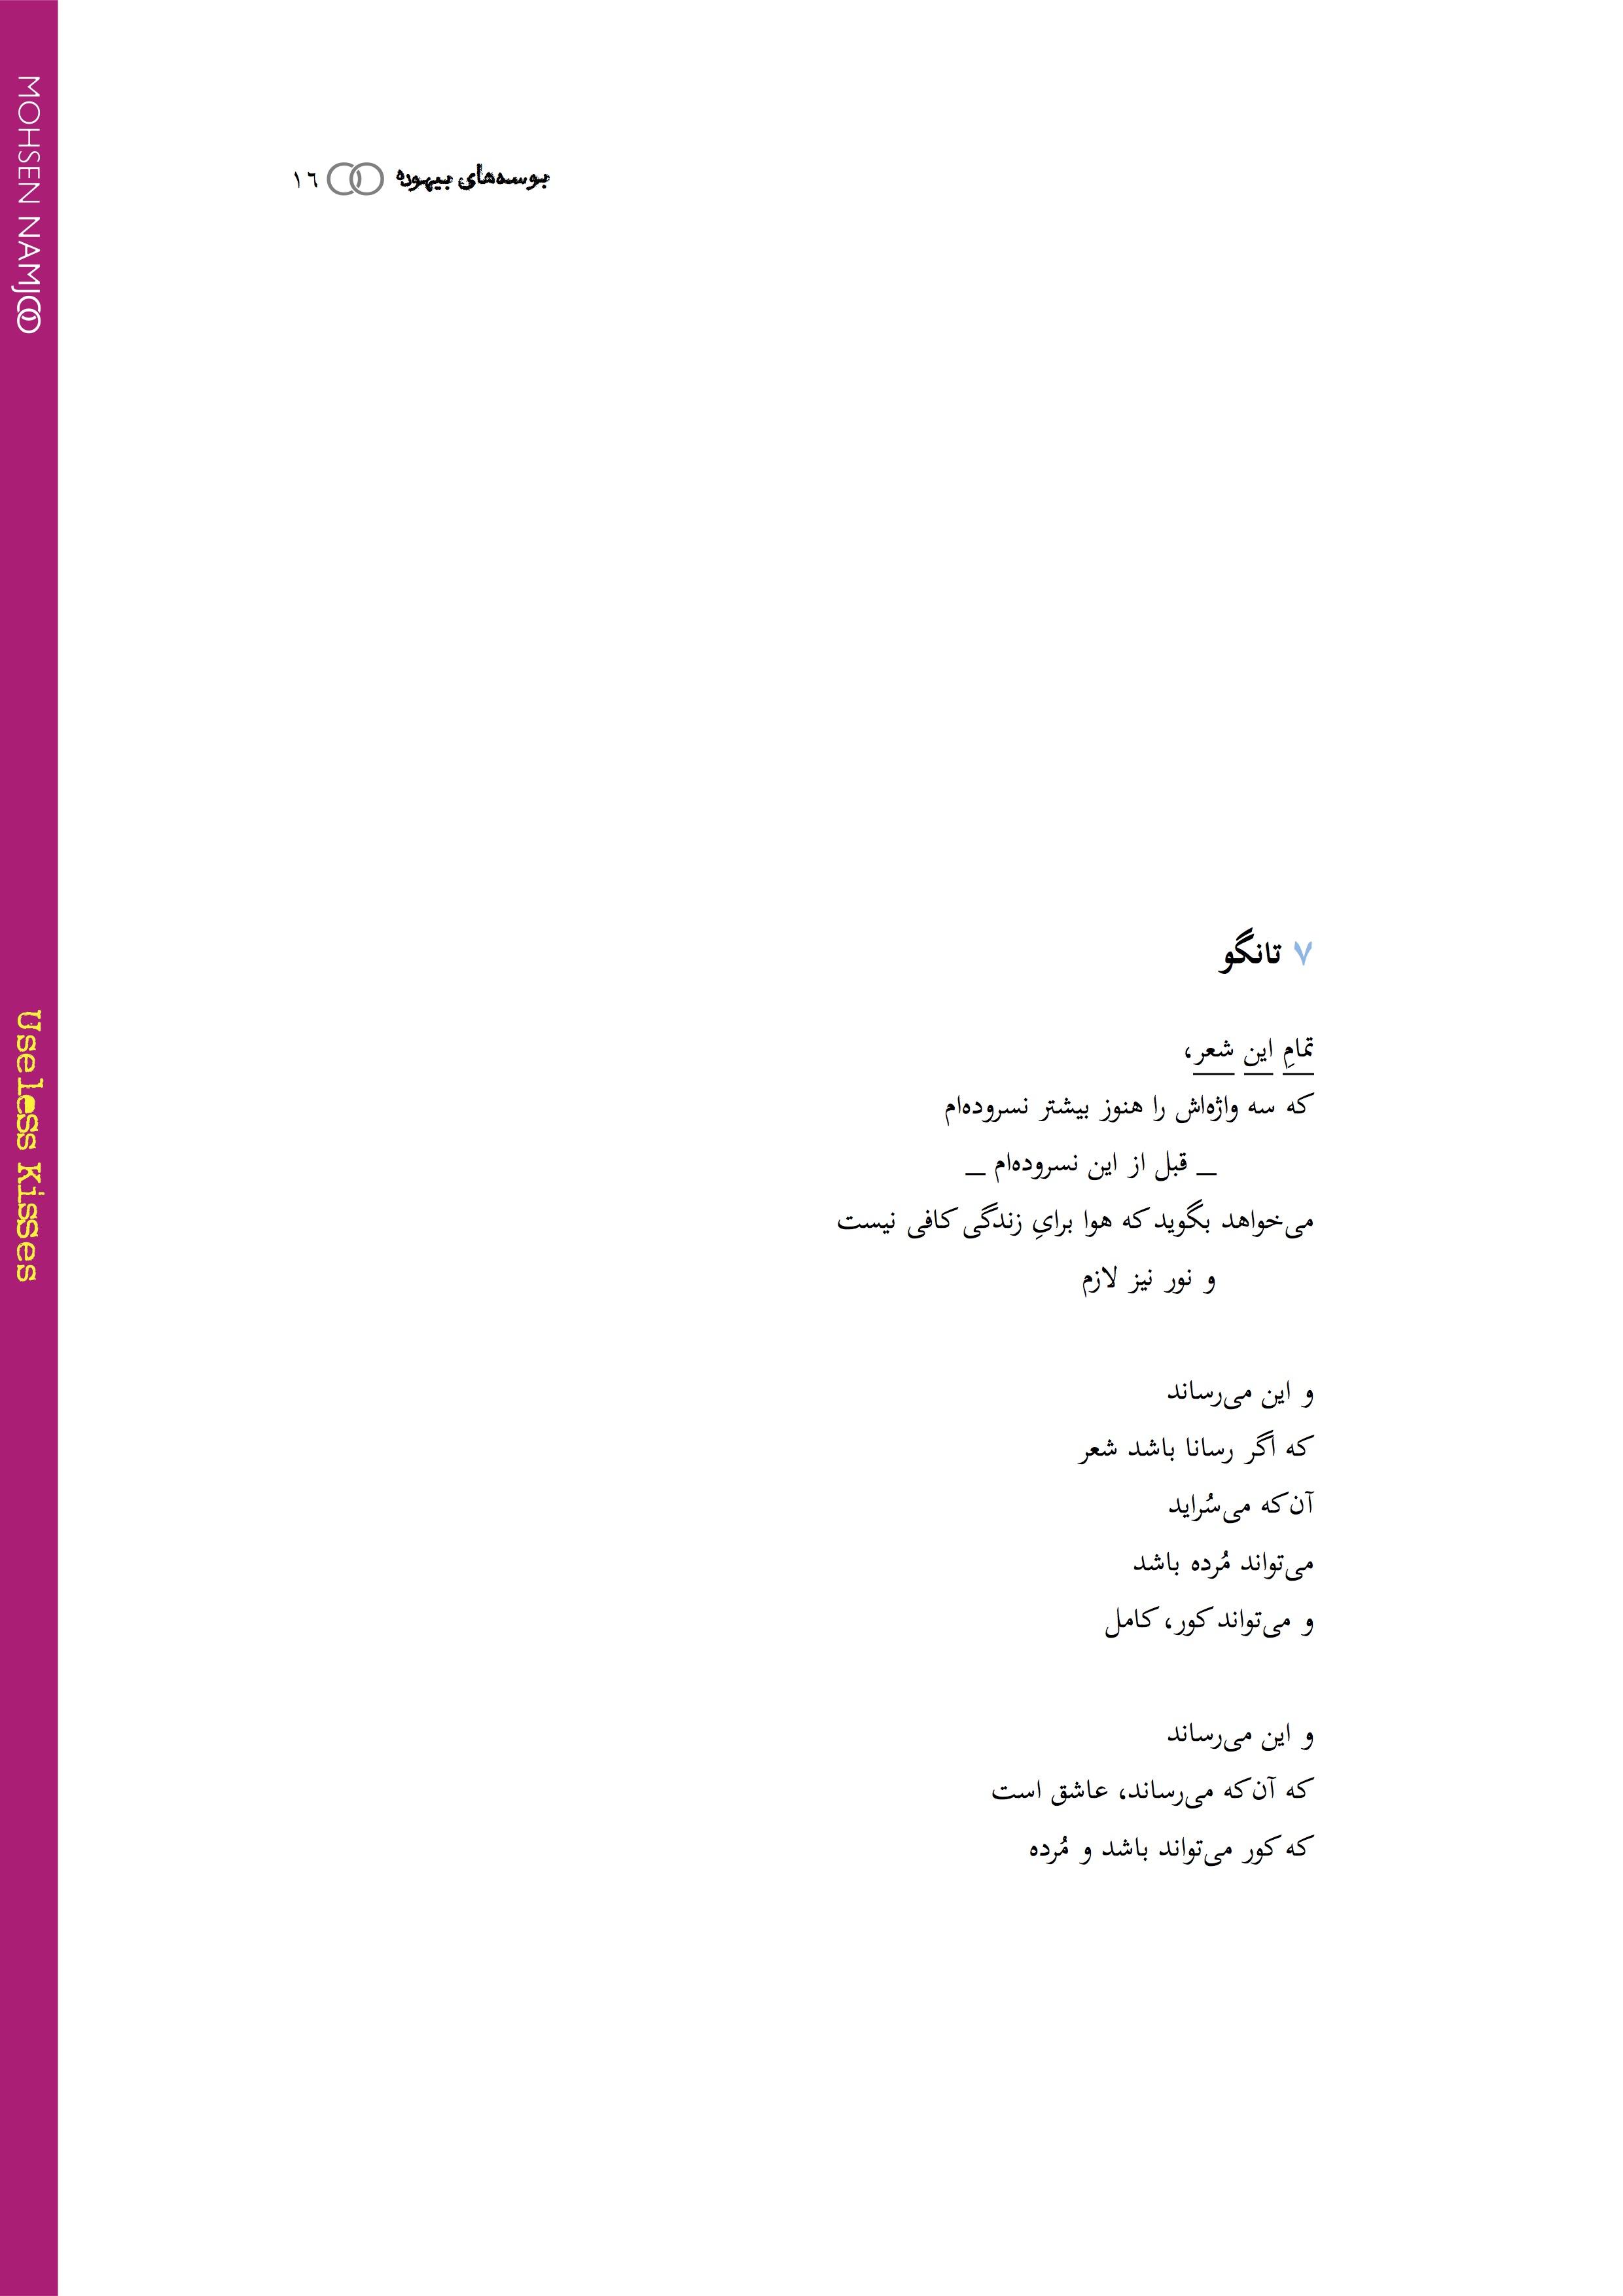 15Useless Kisses eBook (2nd Edition).jpg